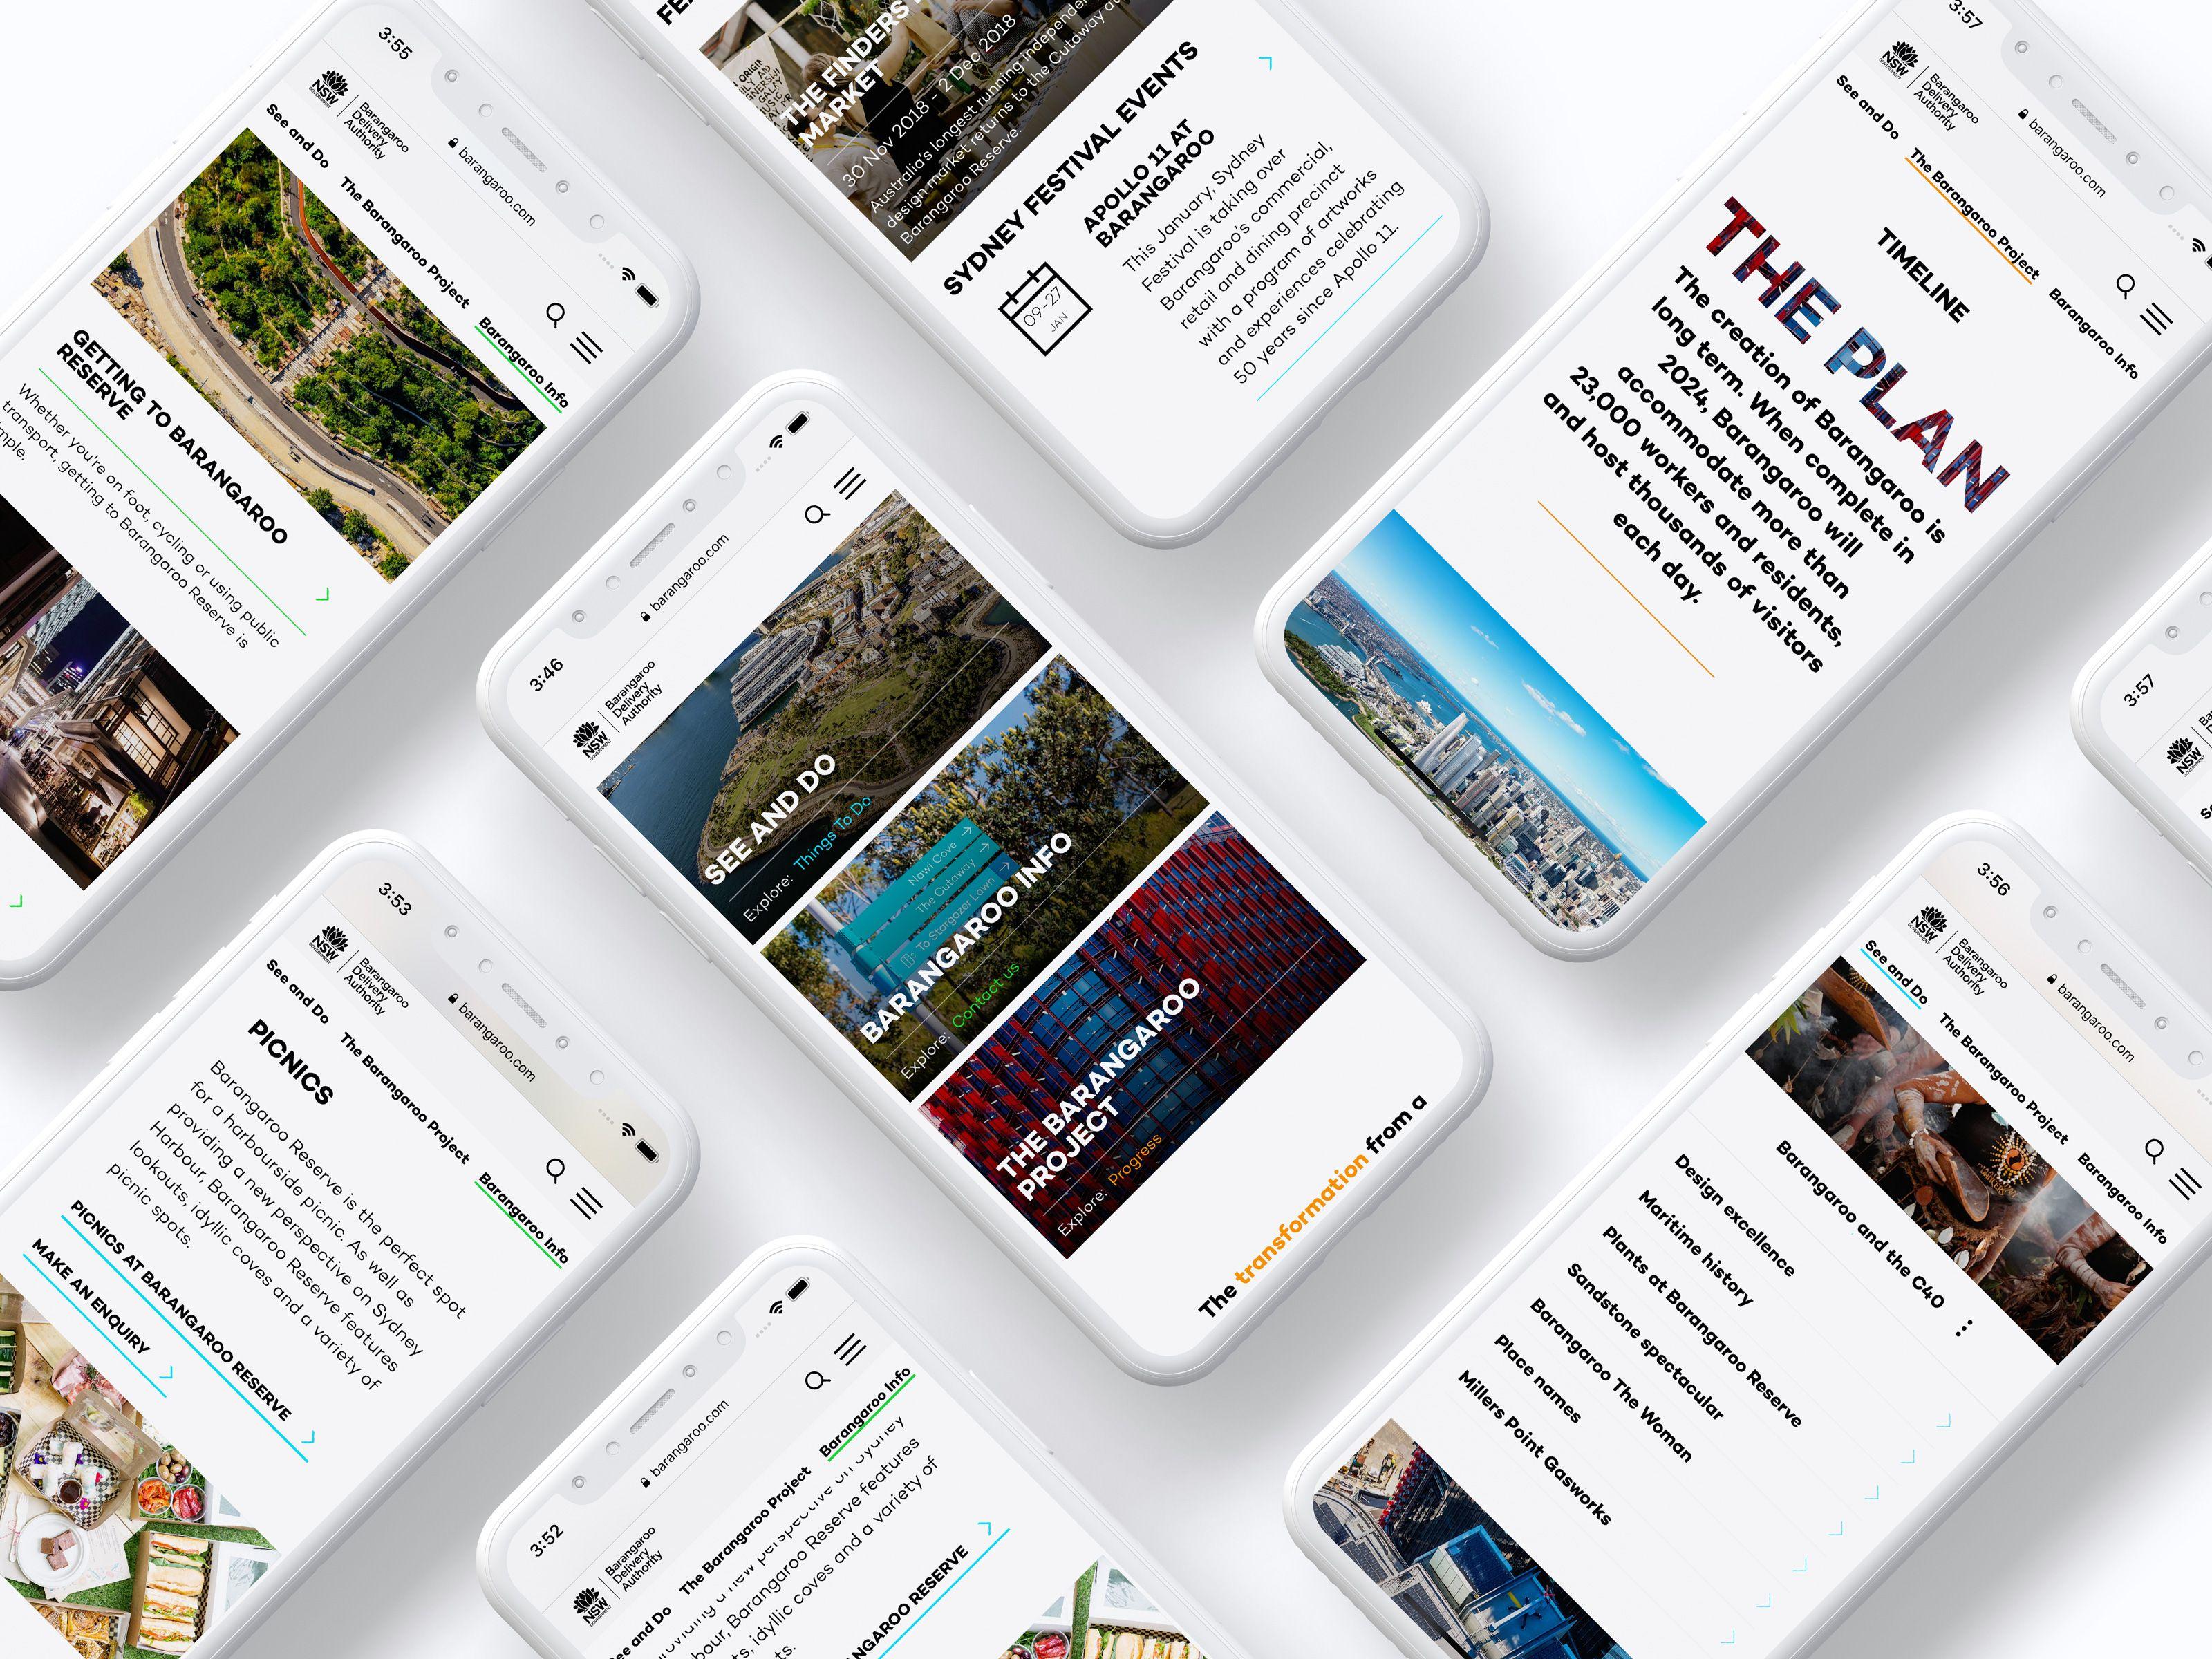 Several screenshots of the Barangaroo website as seen on an iPhone X device